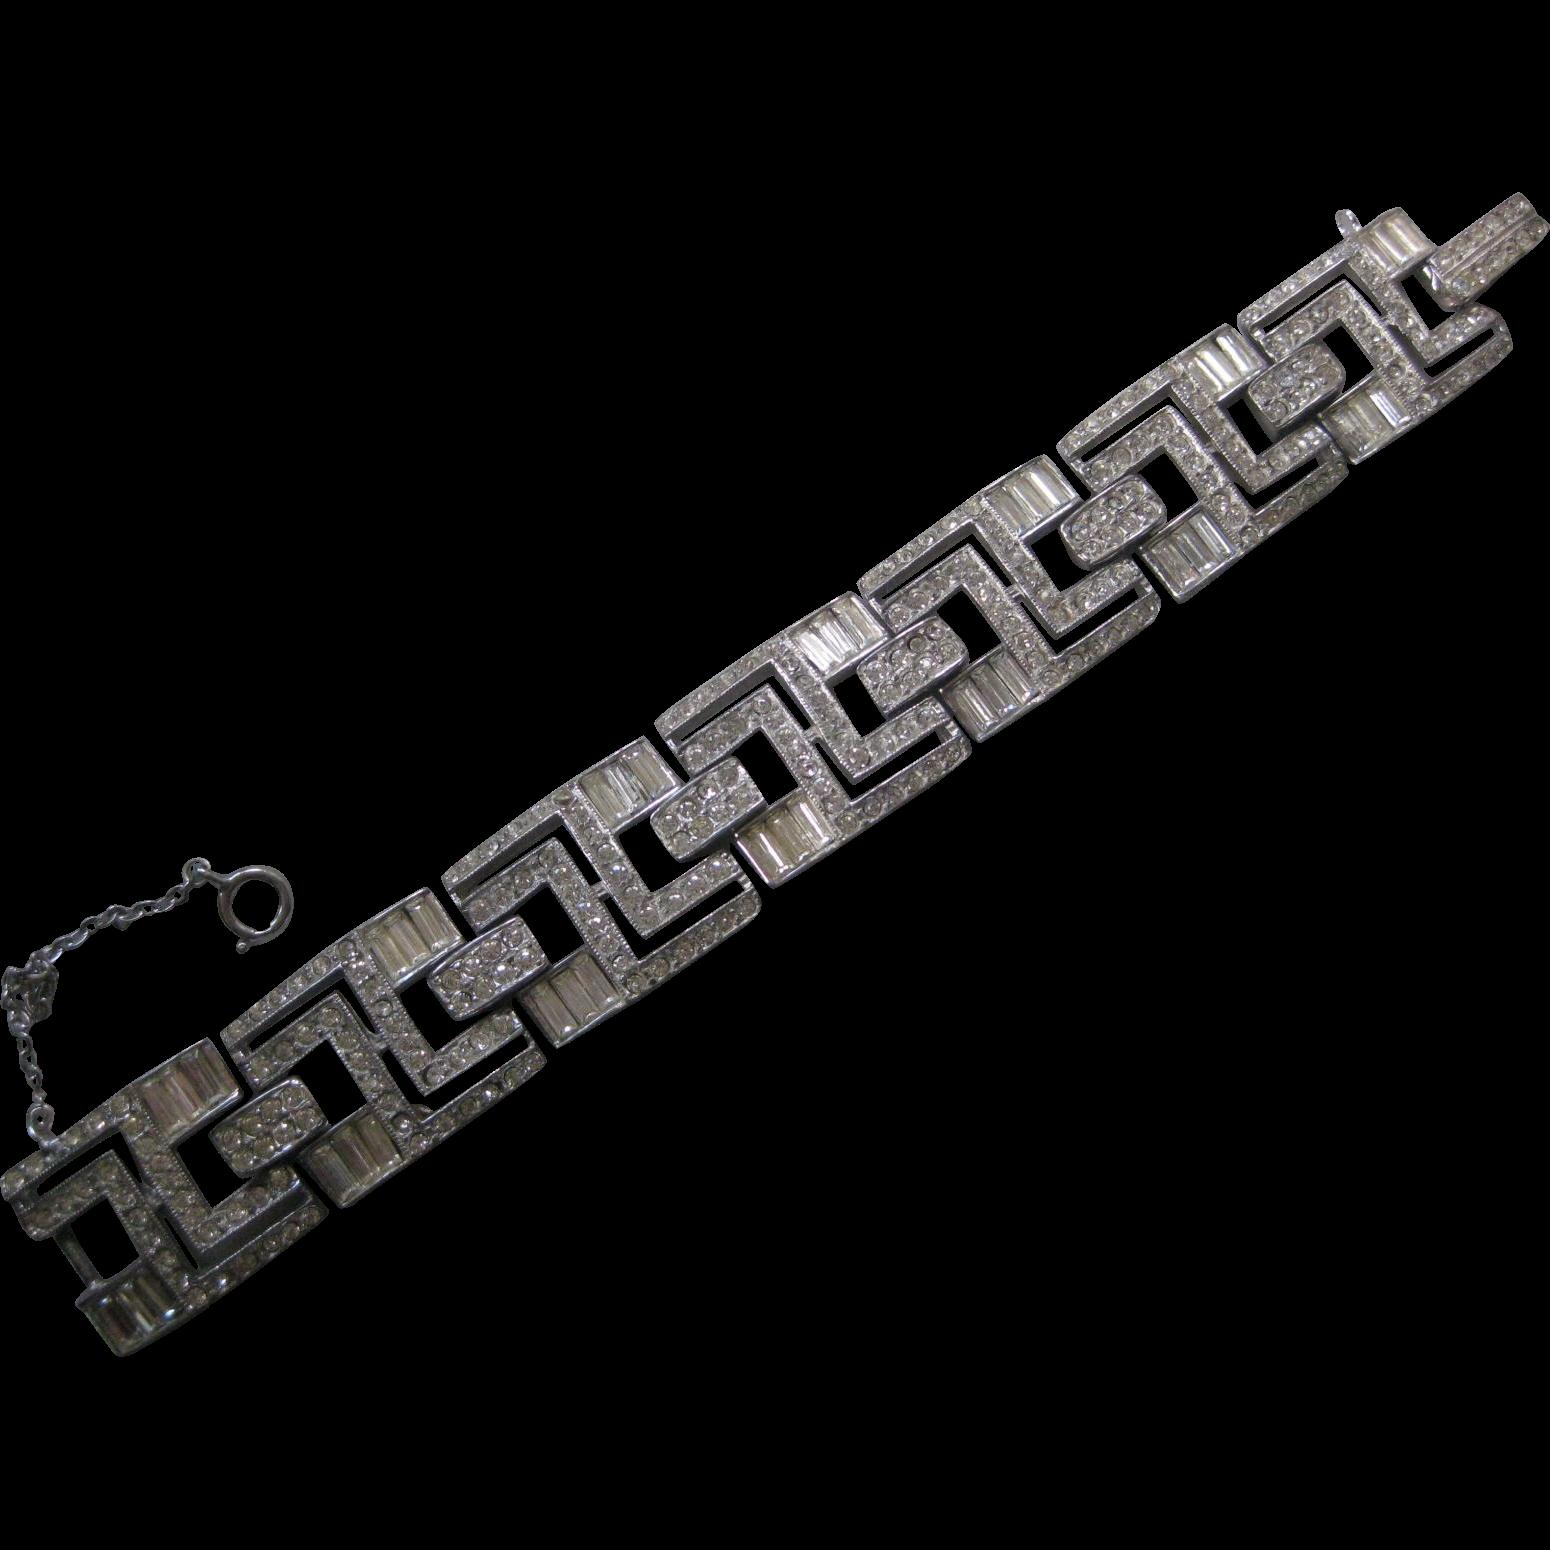 ART DECO French Paste Rhinestone Vintage Bracelet